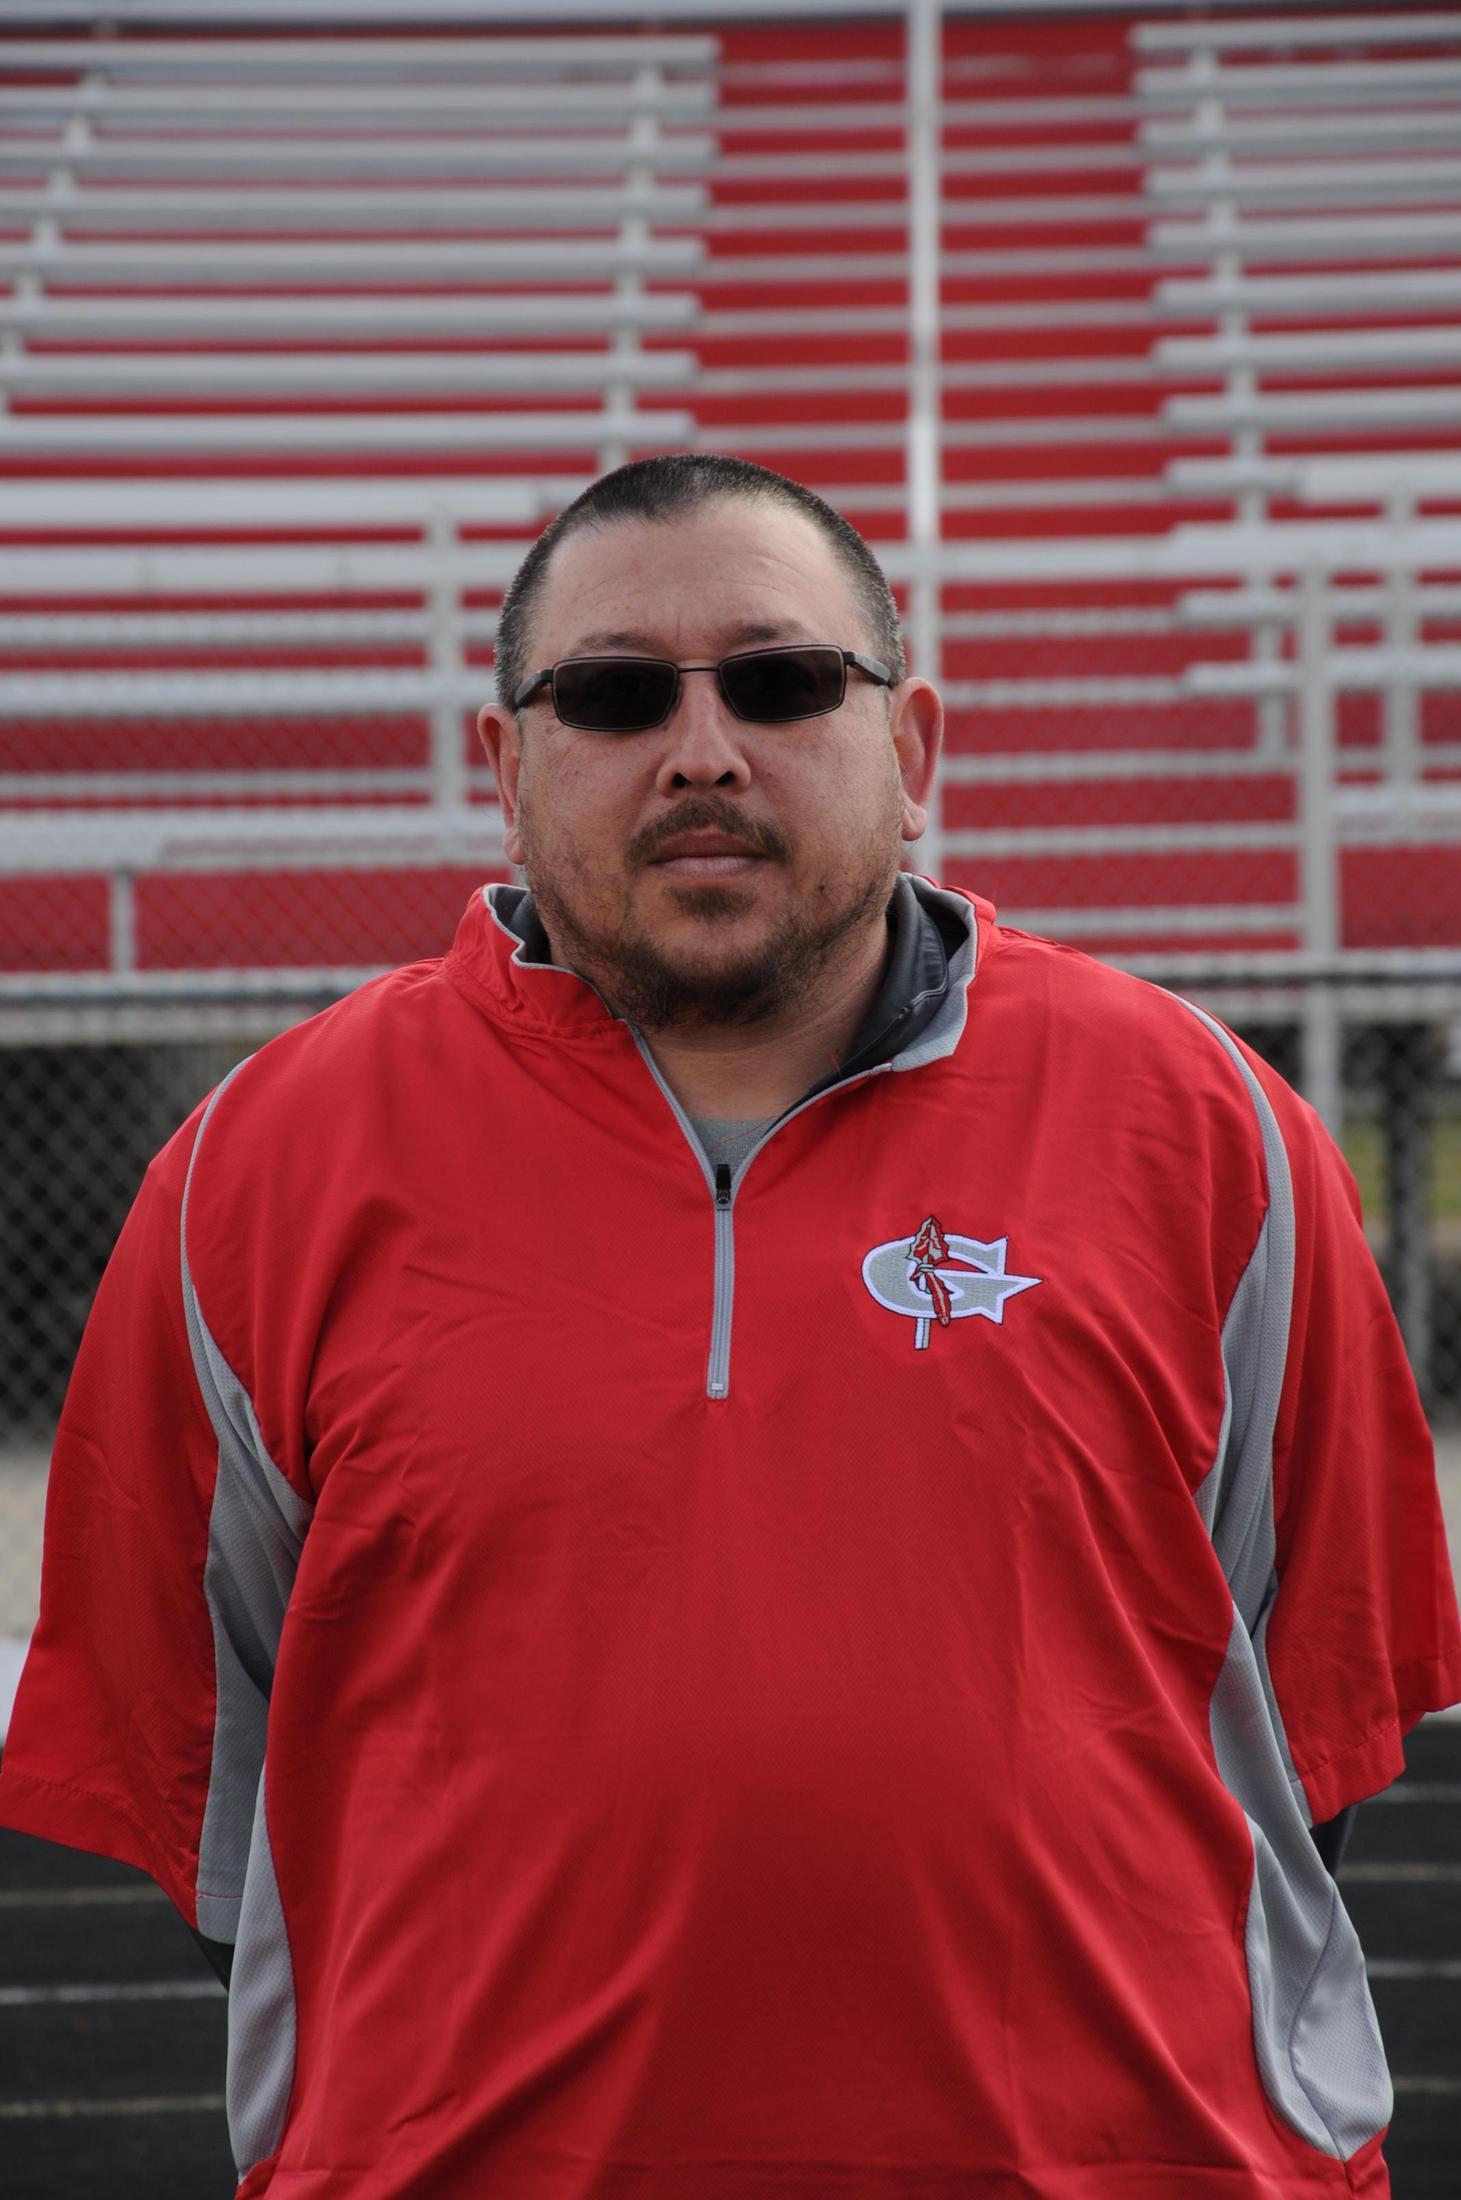 JV Coach Ulrey